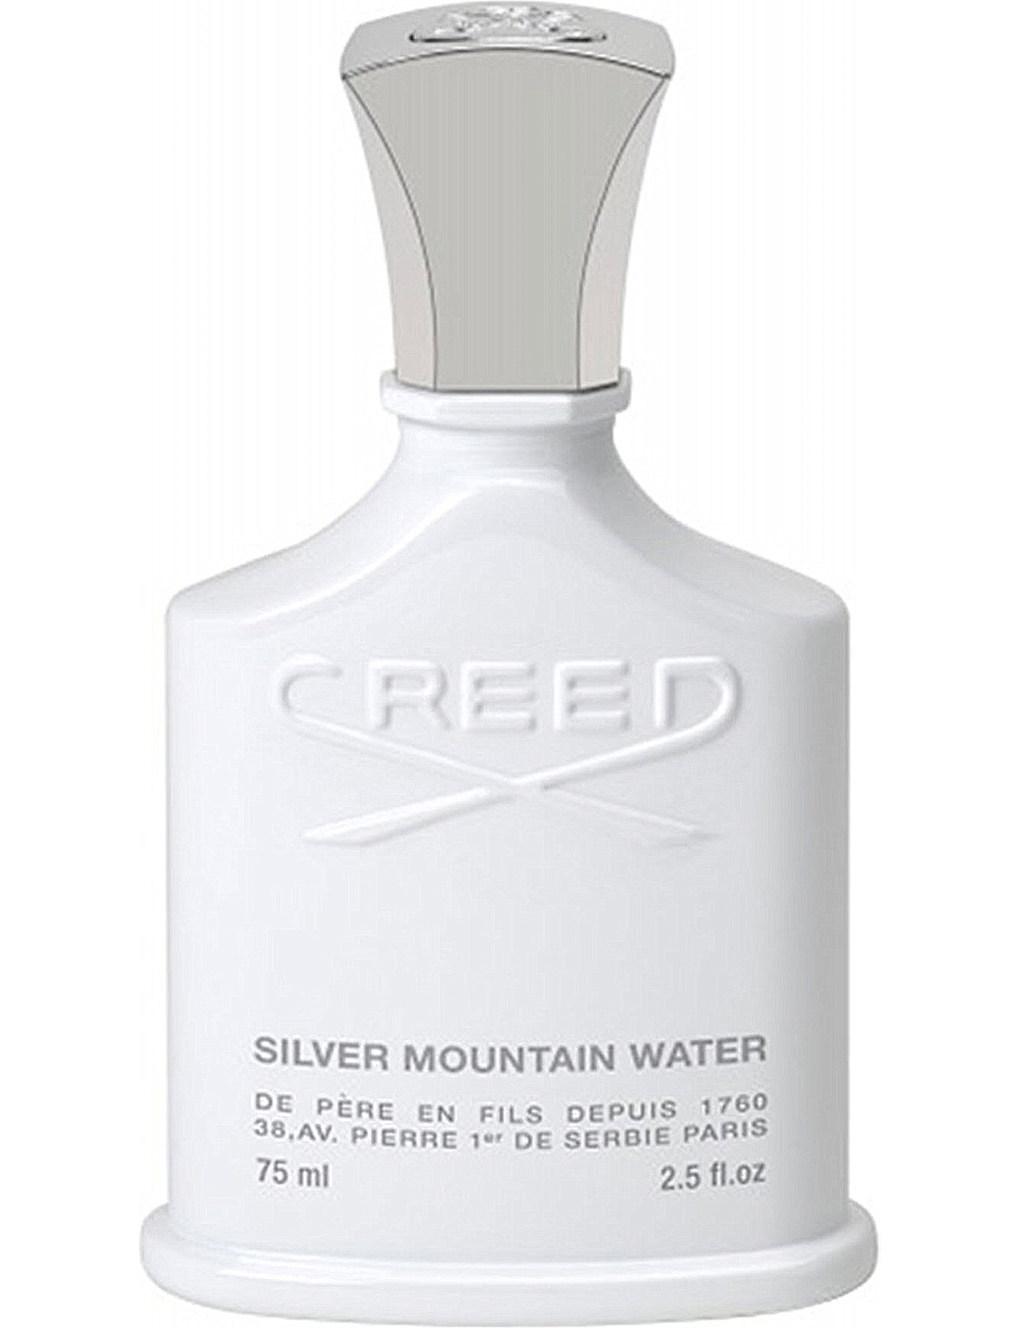 SILVER MOUNTAIN WATER by CREED 5ml Travel Spray MANDARIN GALBANUM Perfume